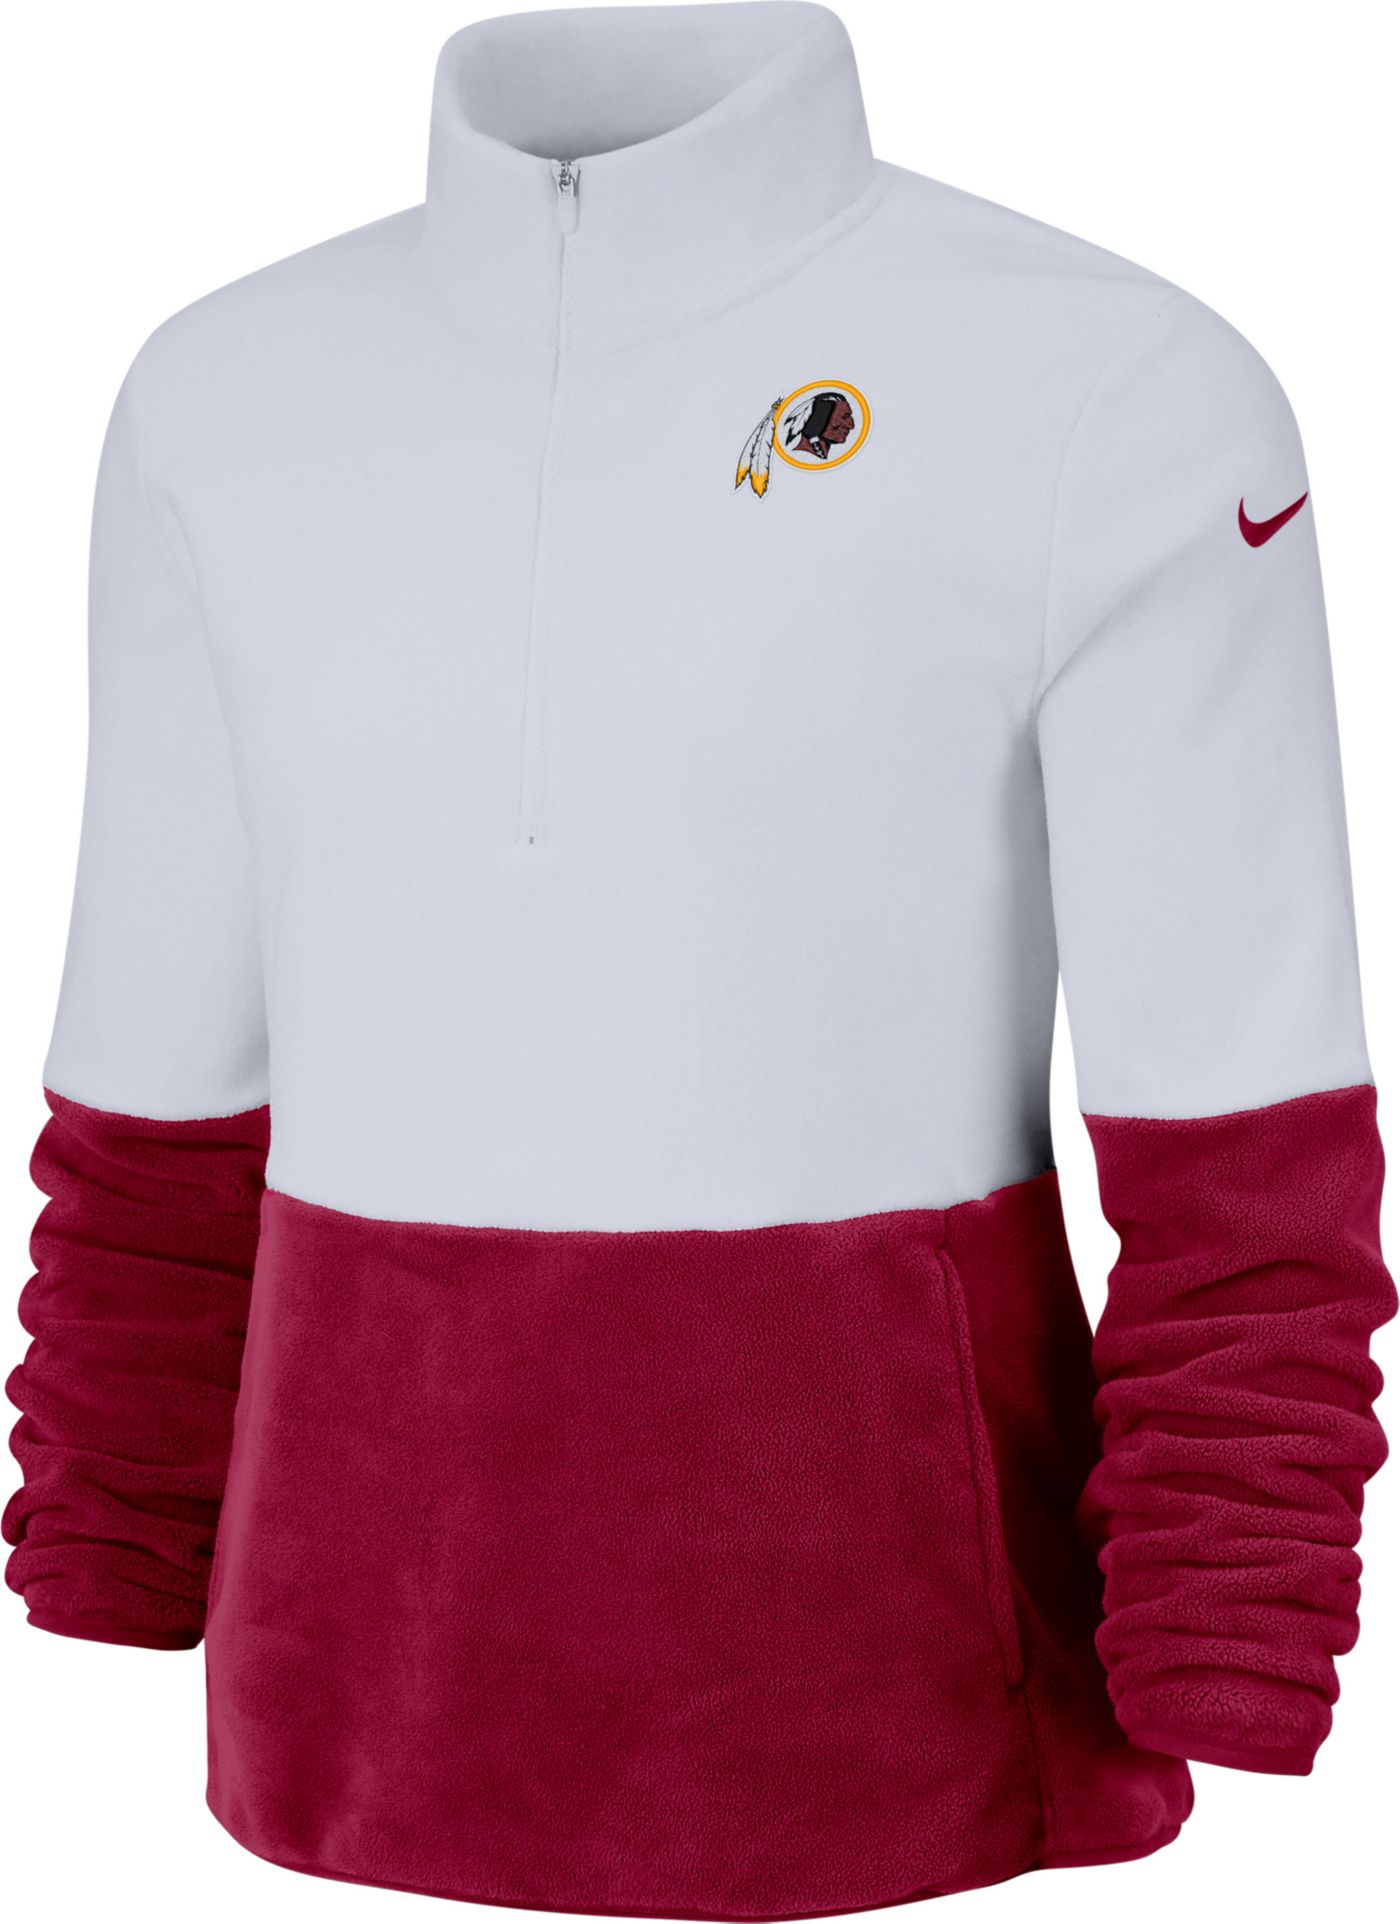 Nike Women's Washington Redskins Therma-FIT Fleece Half-Zip Pullover